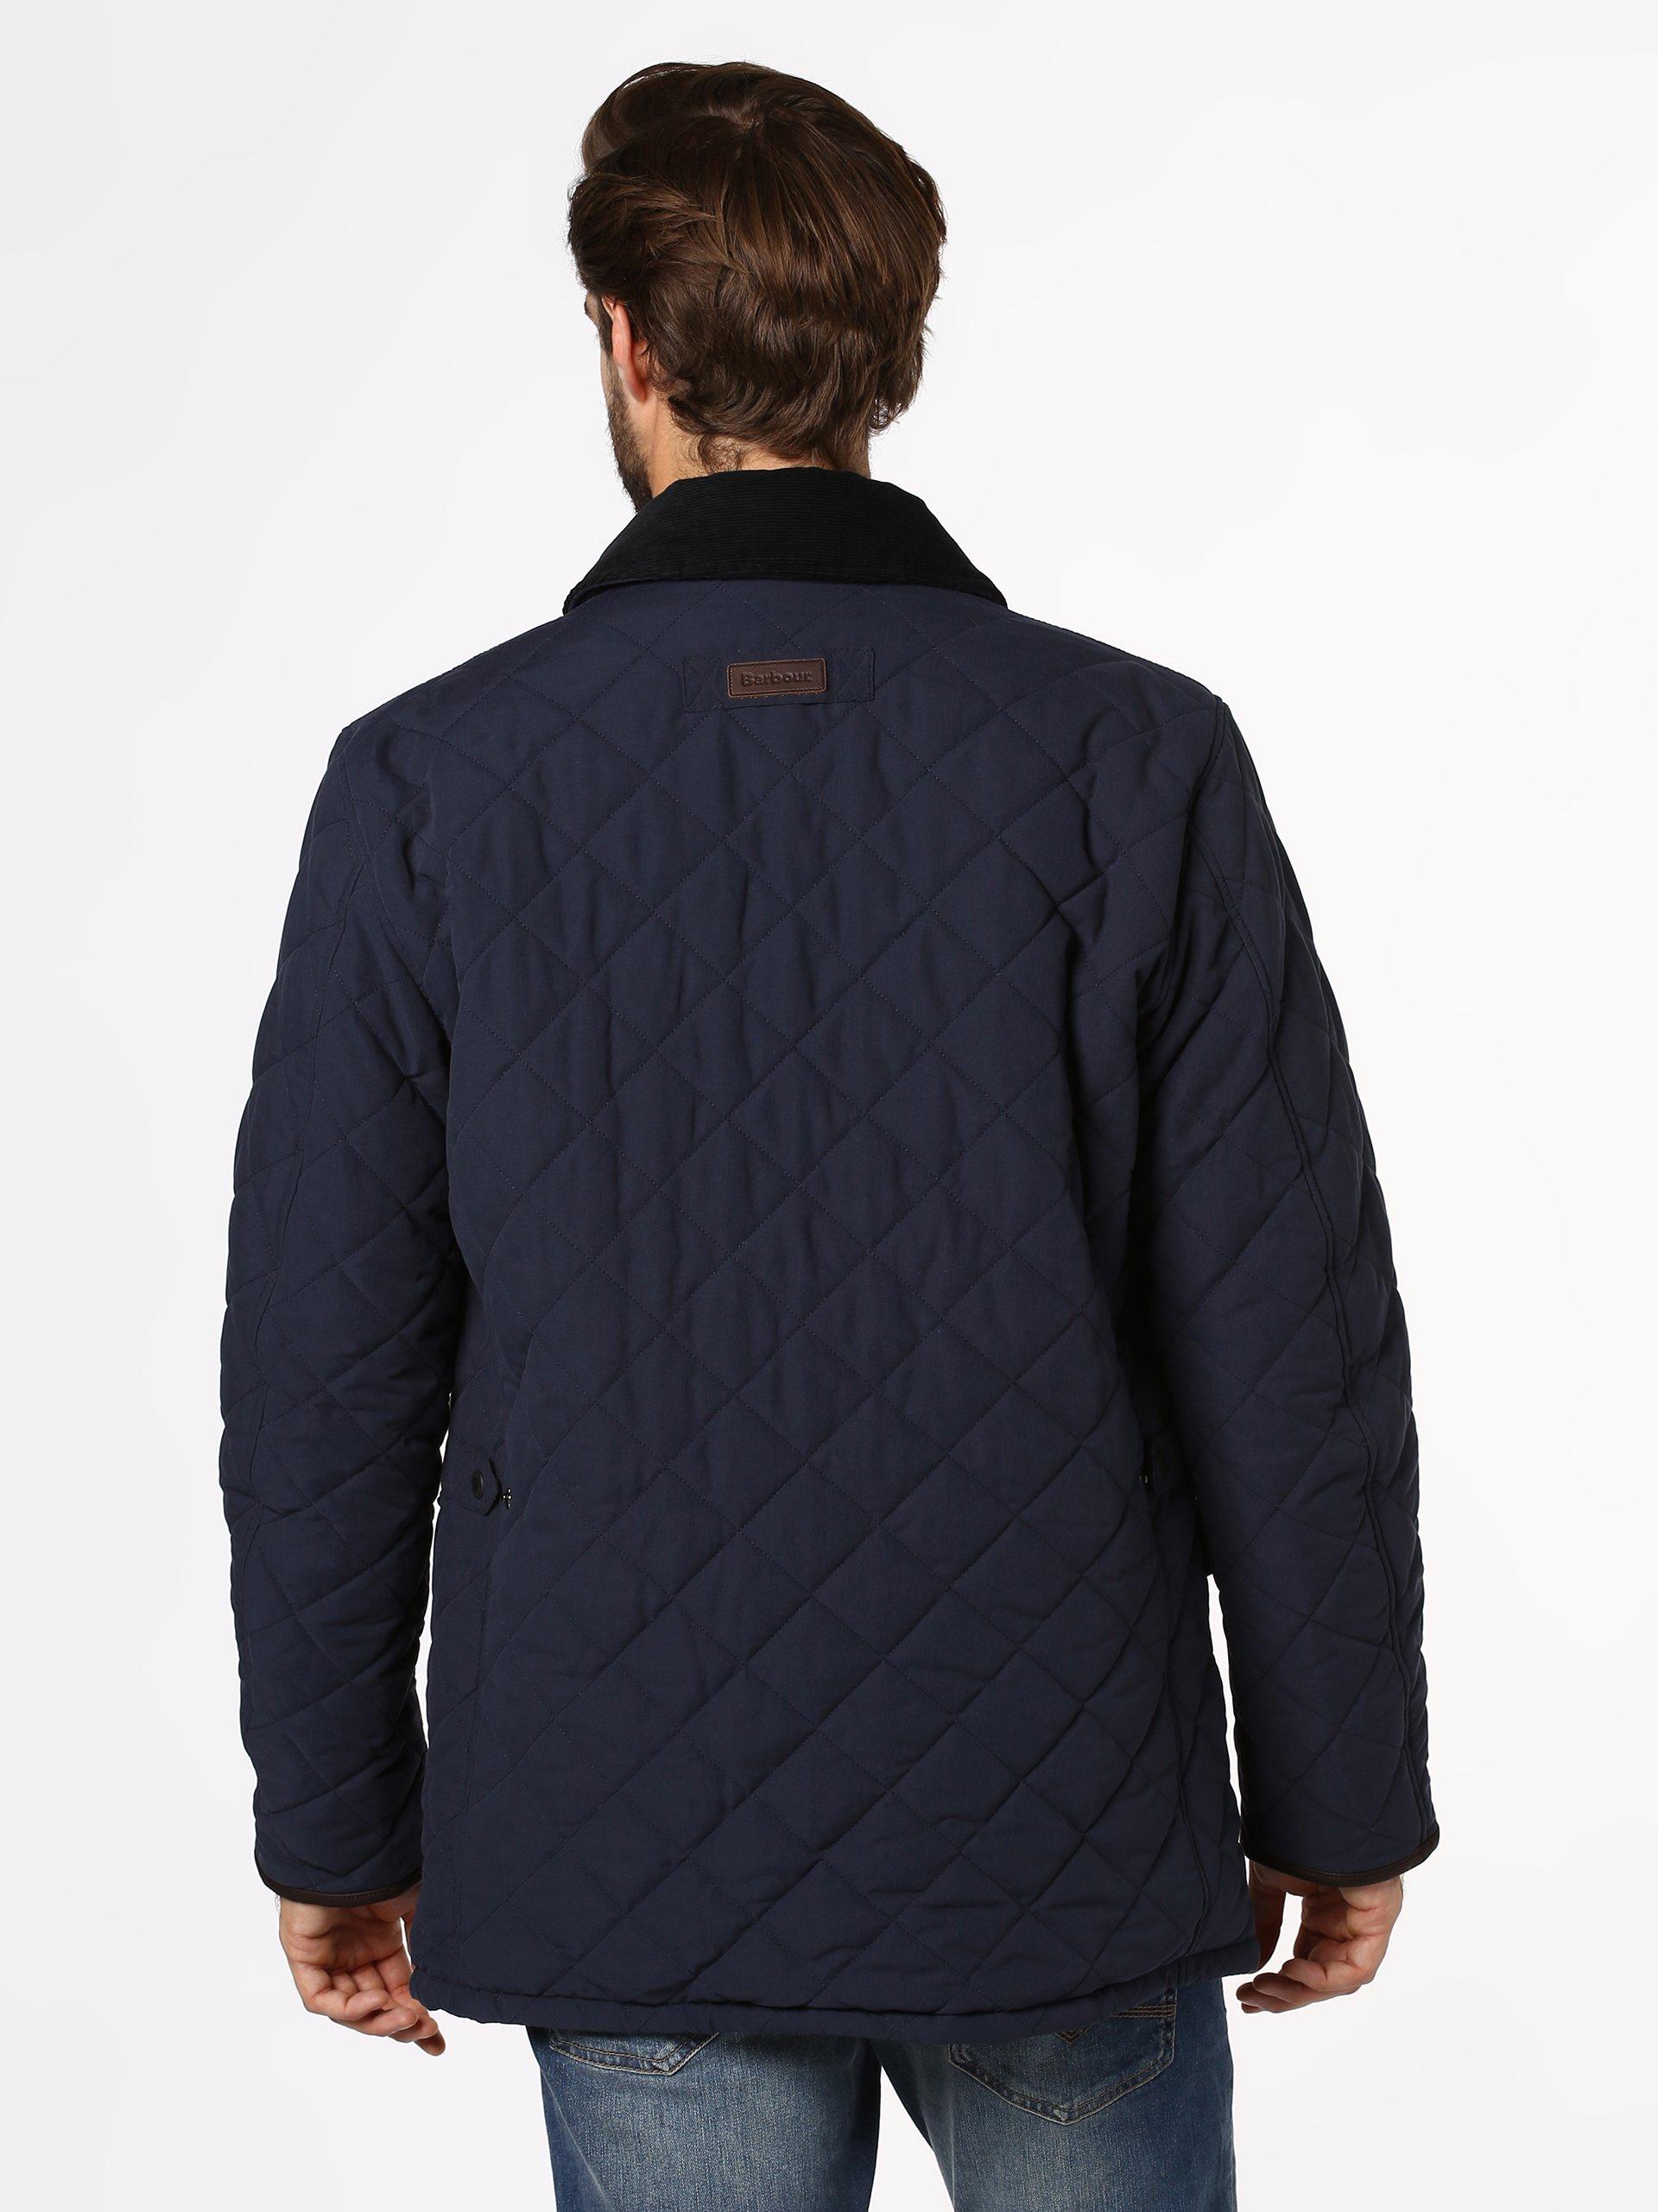 Barbour Męska kurtka pikowana